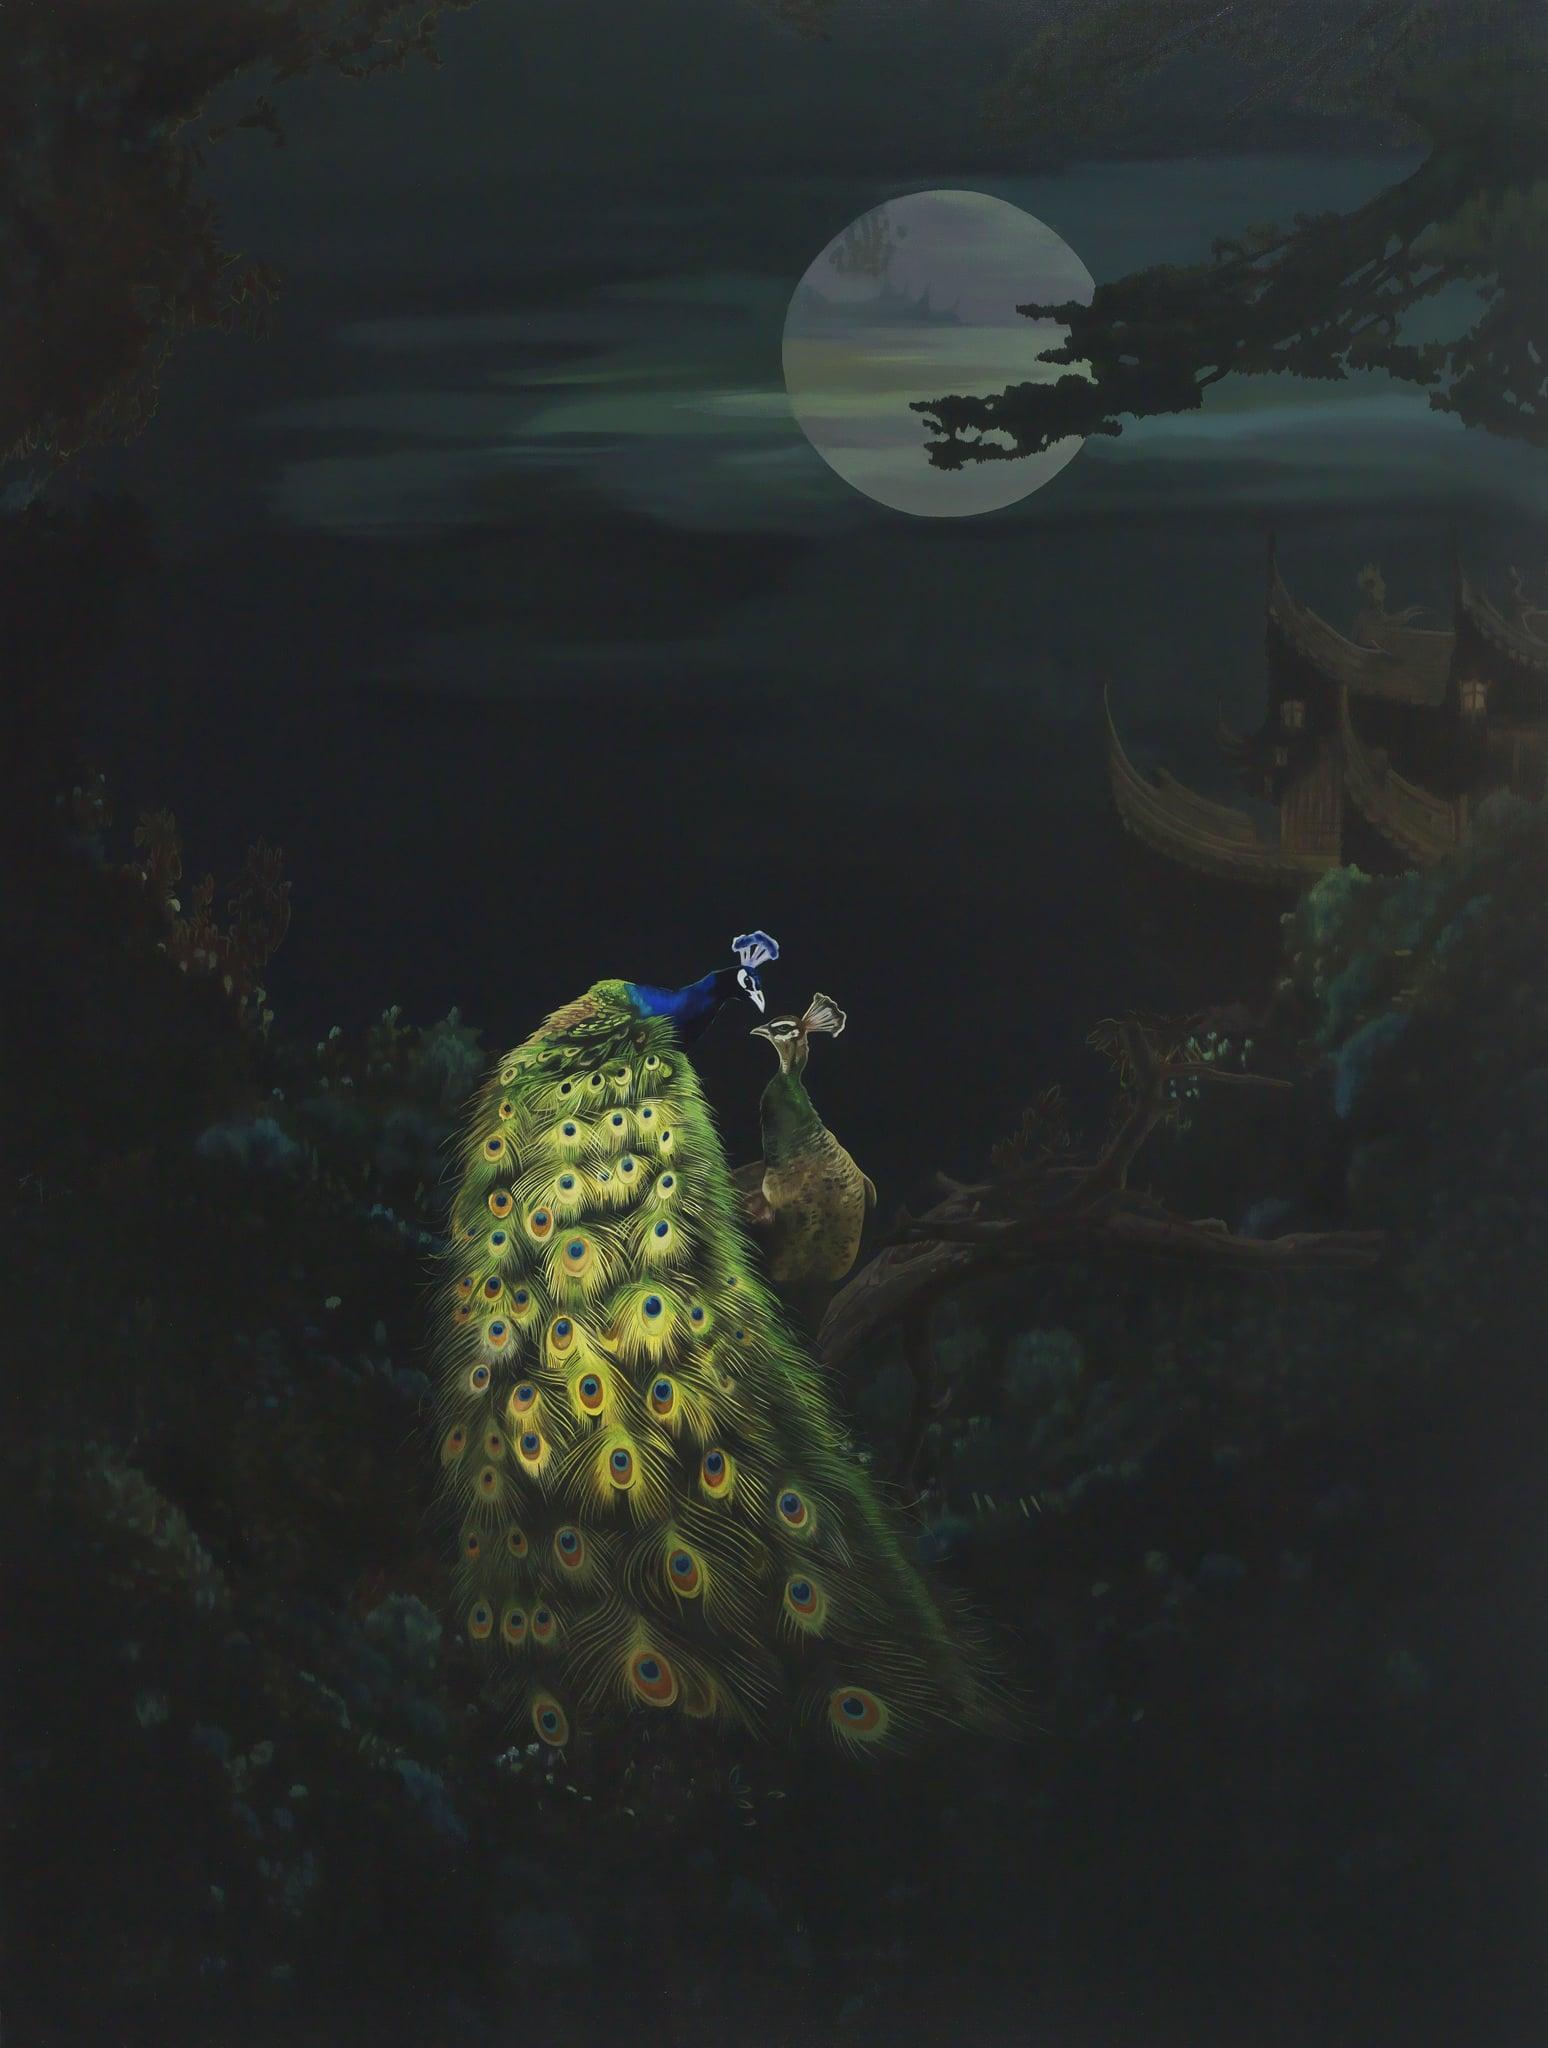 萬太豐 浮生之鳳求凰‧3 油畫畫布 200x150cm │2014 (傳承藝術中心) %2F Tai-Feng WAN Life Like a Dream‧Love Affair‧3 Oil on Canvas 200x150cm │2014 (CHUAN CHENG ART CENTER)